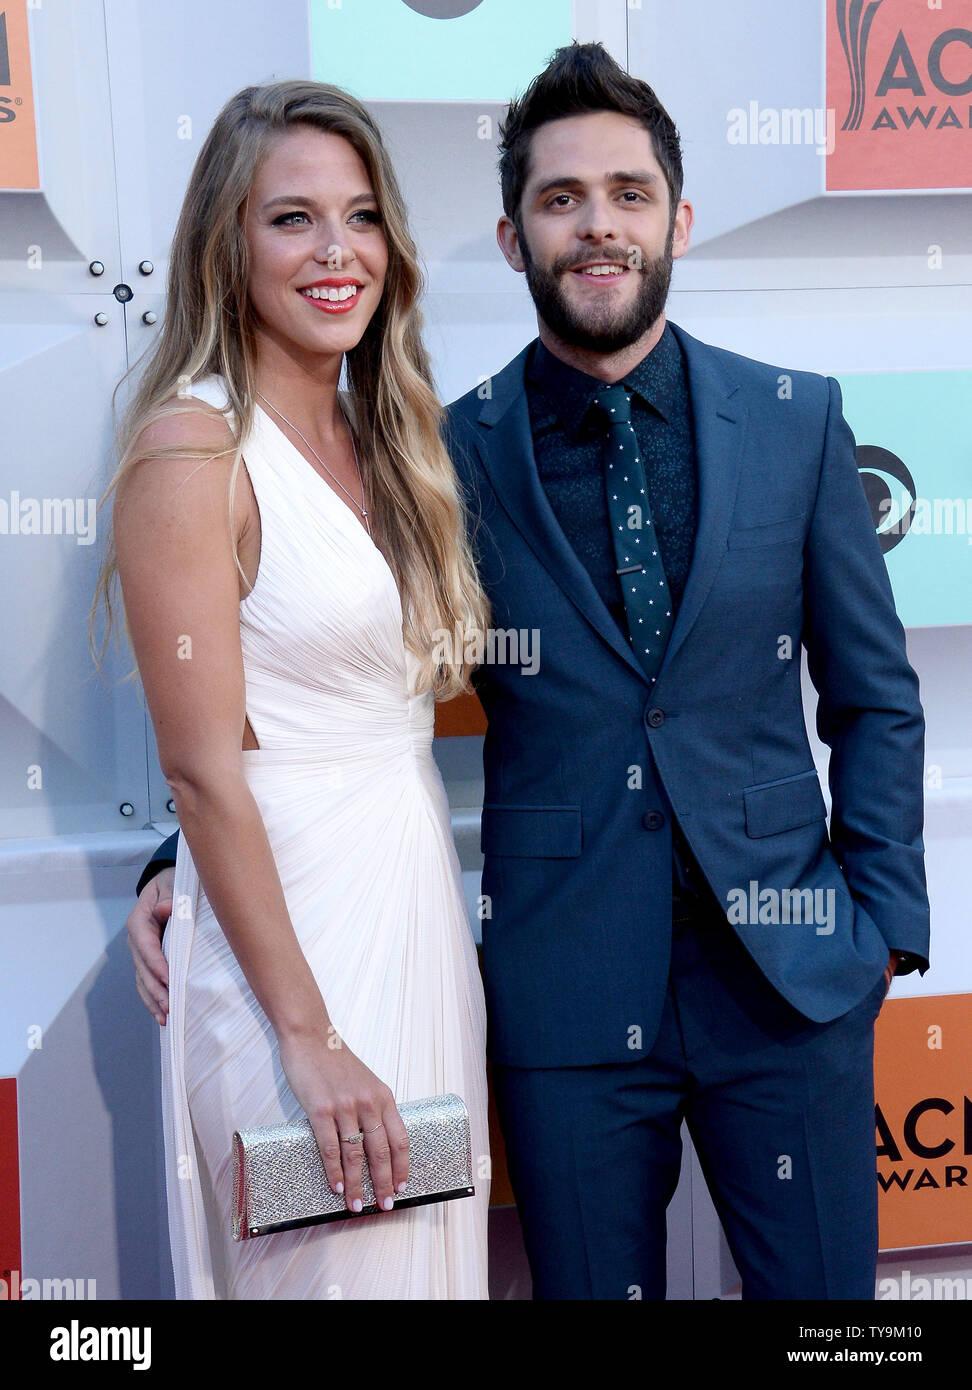 Singer Thomas Rhett R And Lauren Gregory Attend The 51st Annual